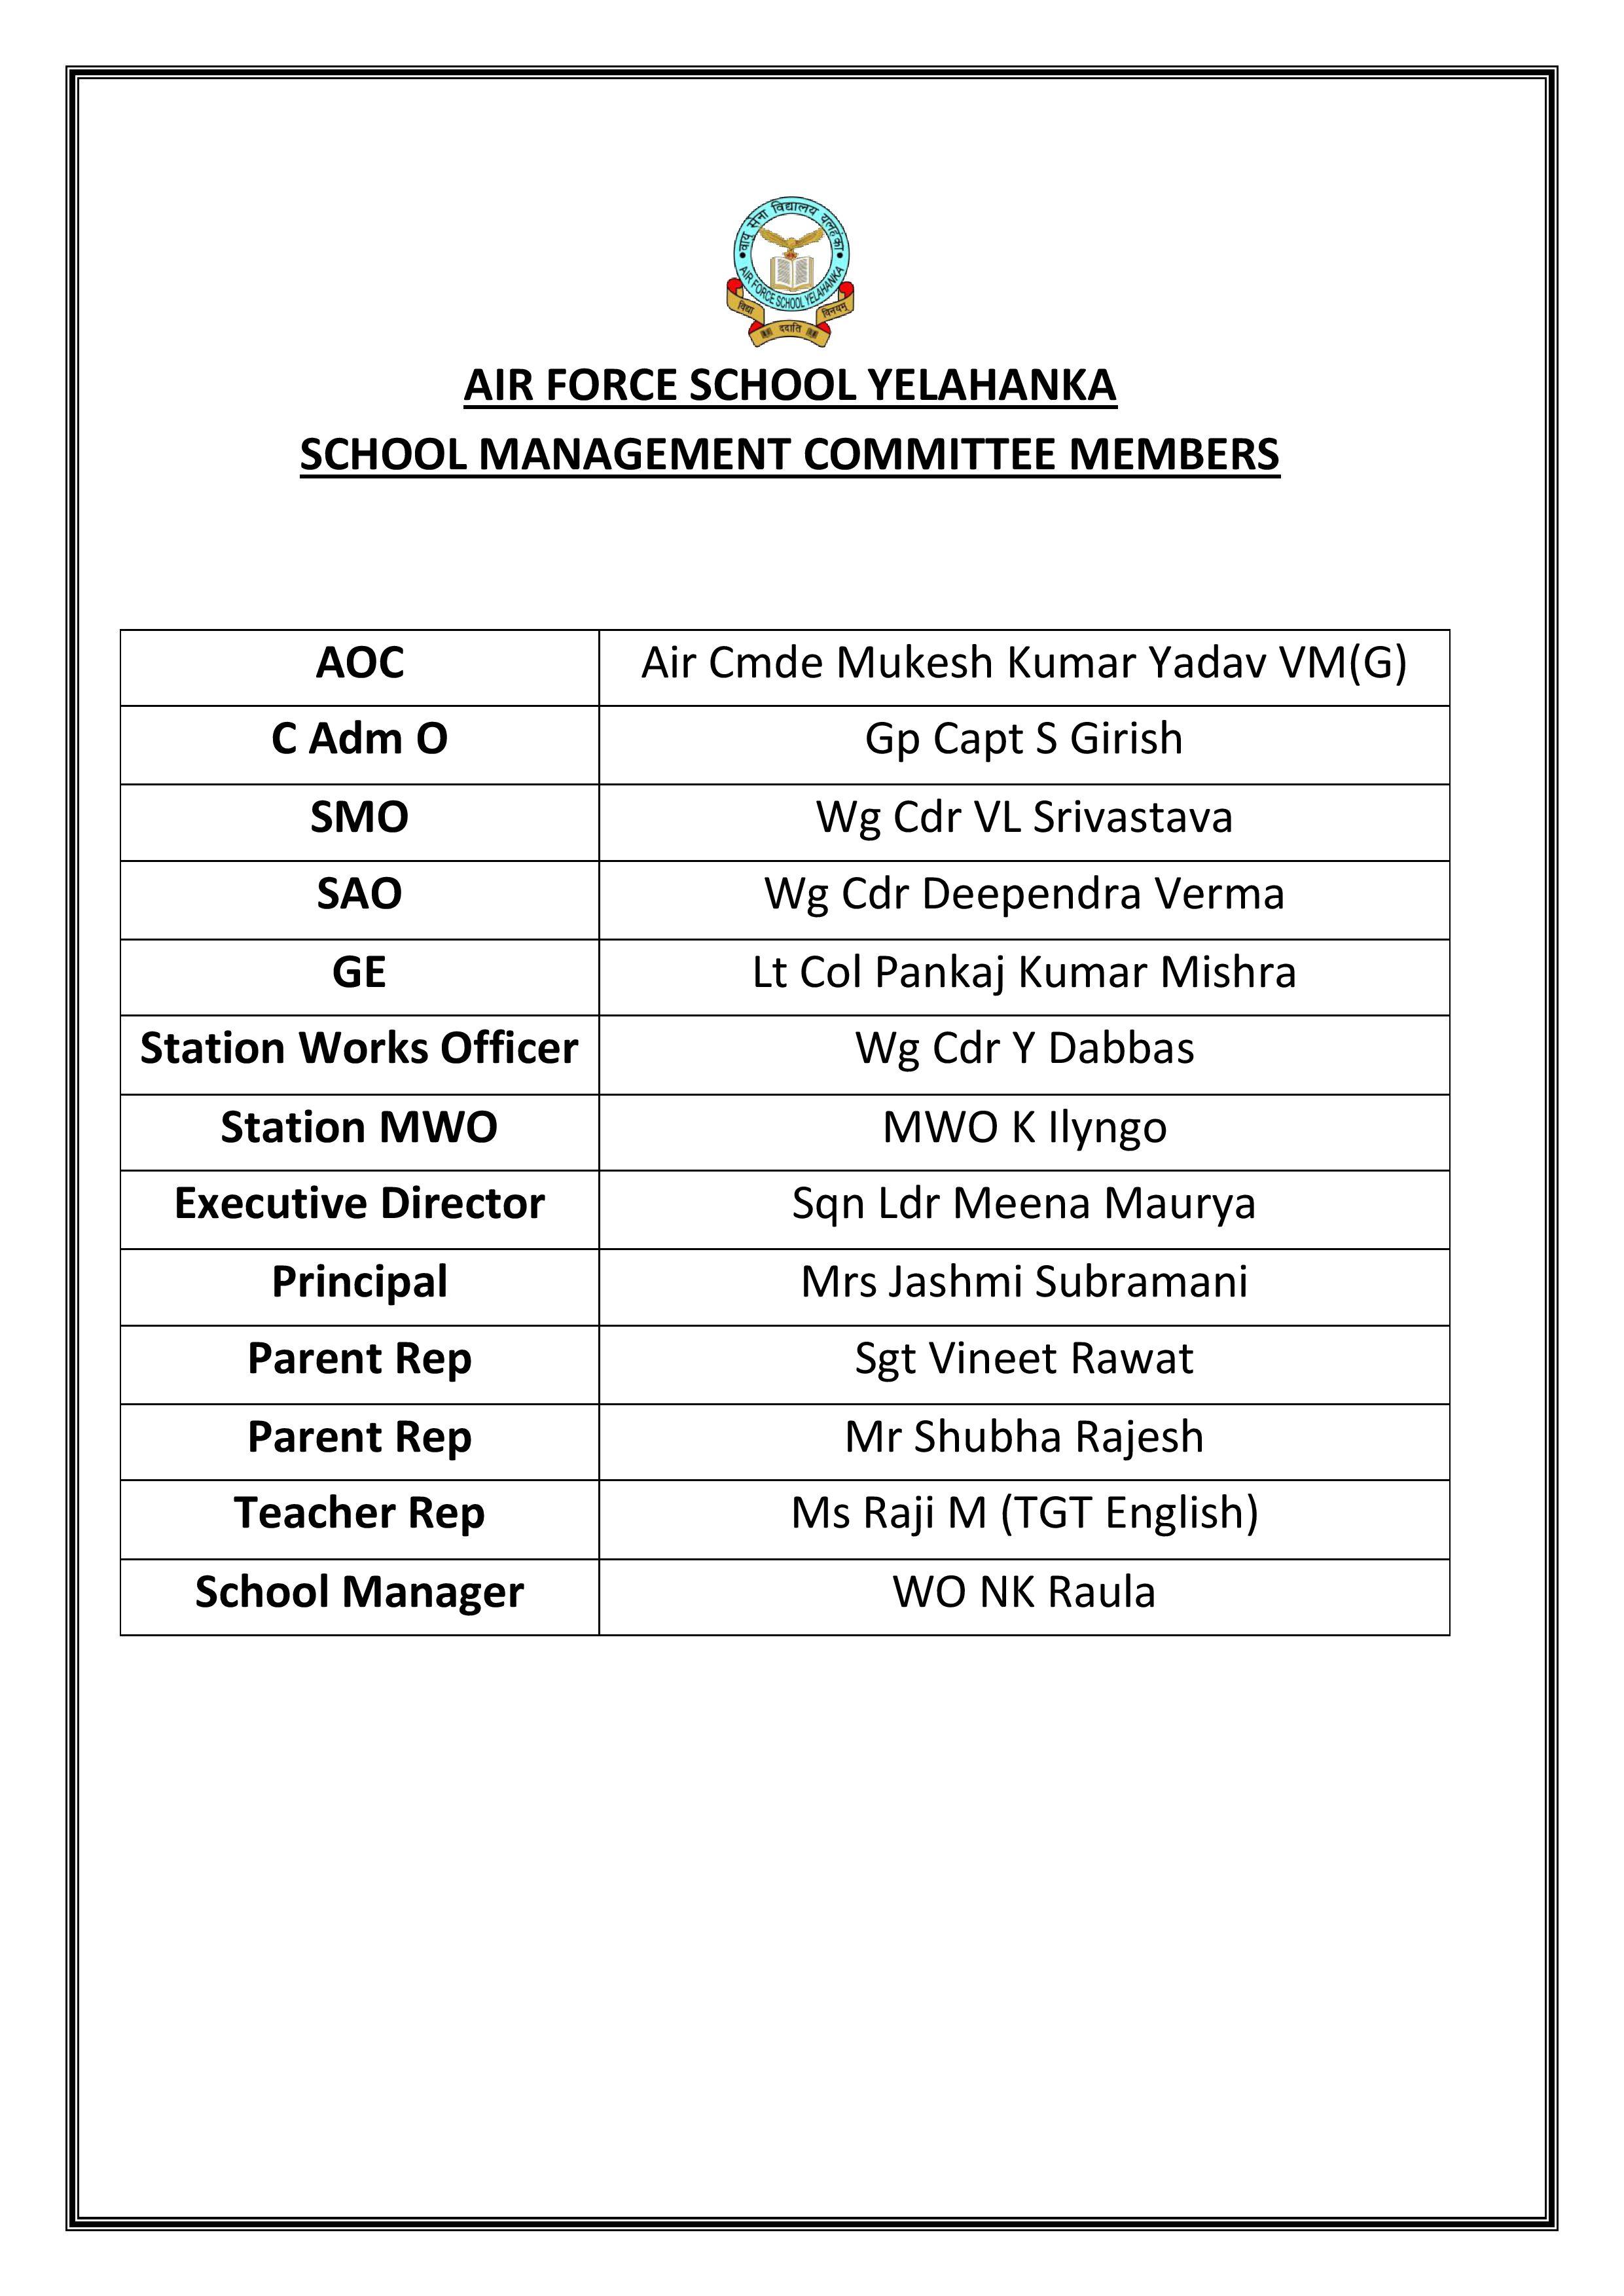 Air Force School Yelahanka, Bangalore